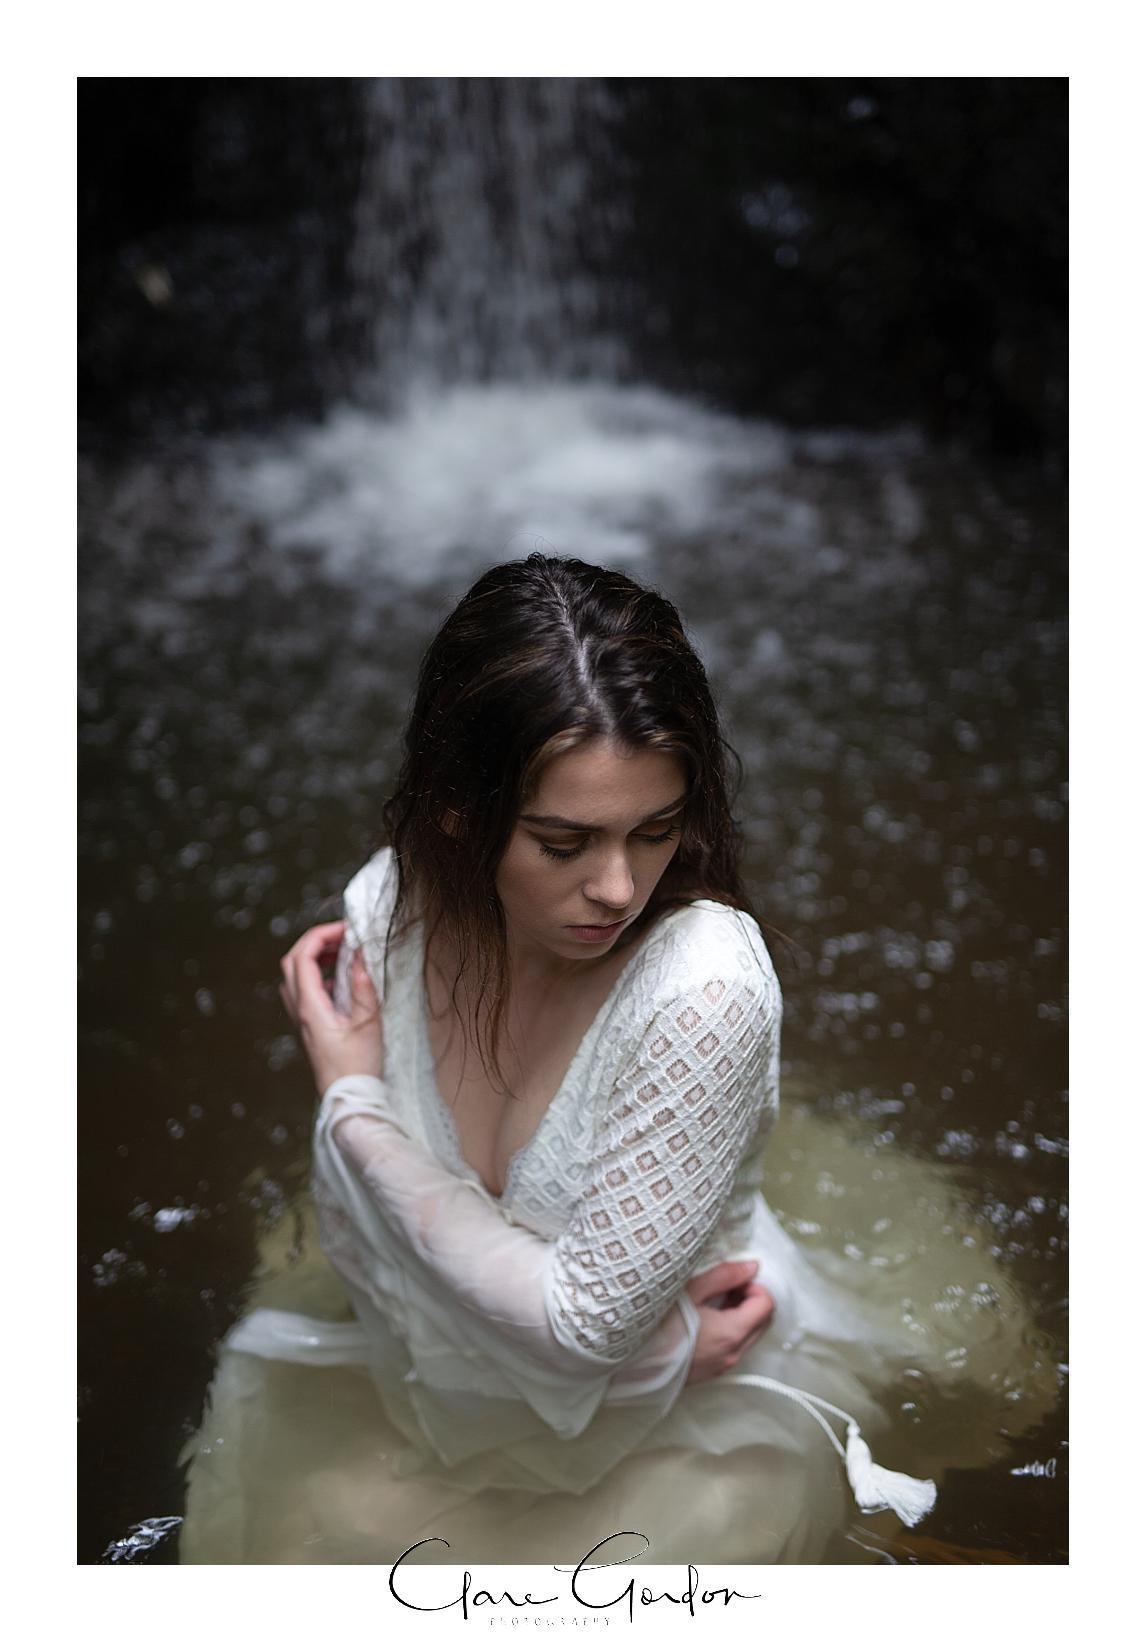 boho-bride-Shoot-Waikato-Wedding-photography-Girl-in Waterfall -New Zealand-wedding (20).jpg